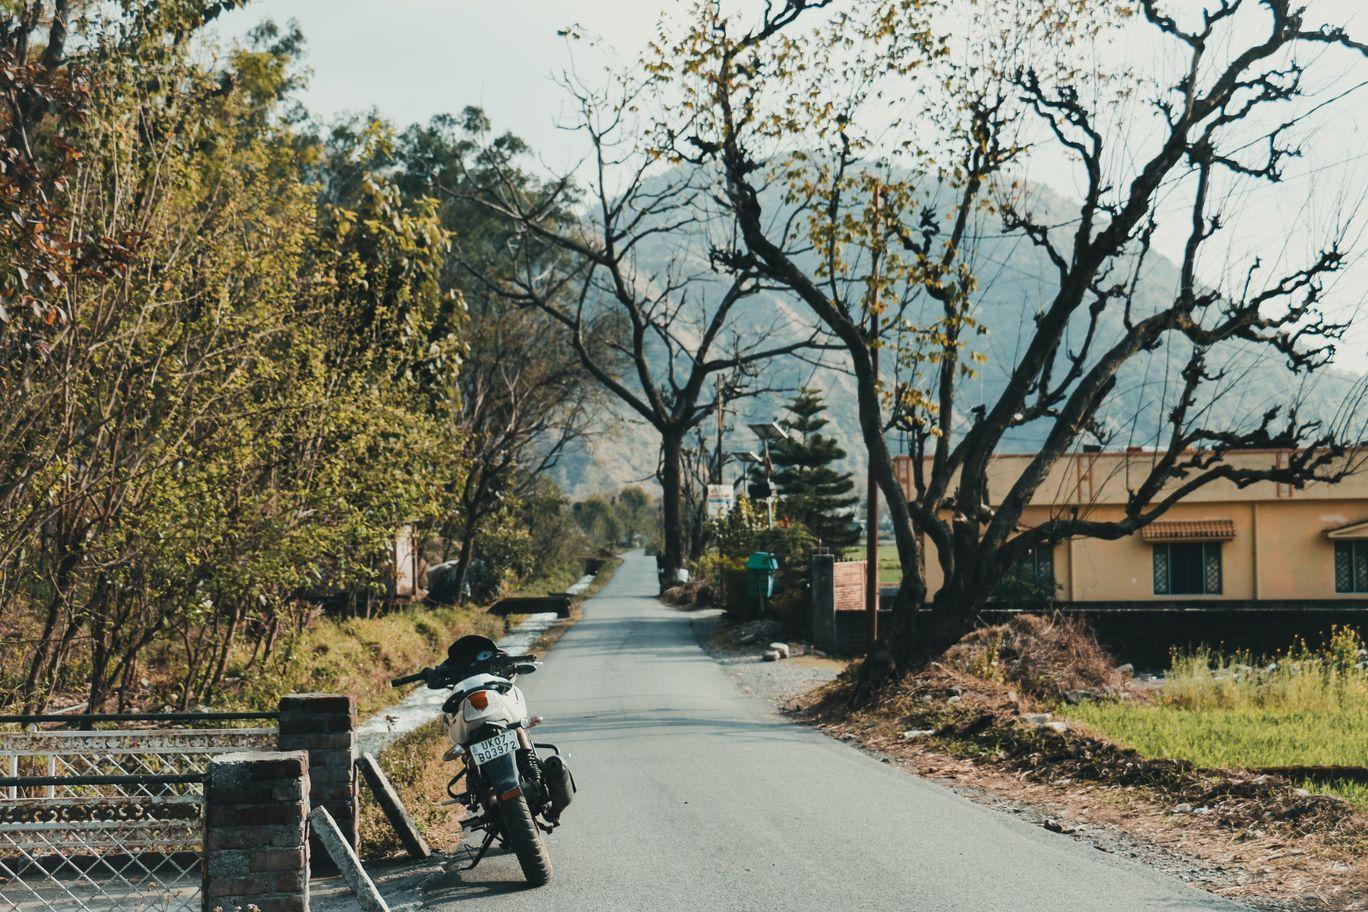 Photo of Maldevta Farms By naveen sharma